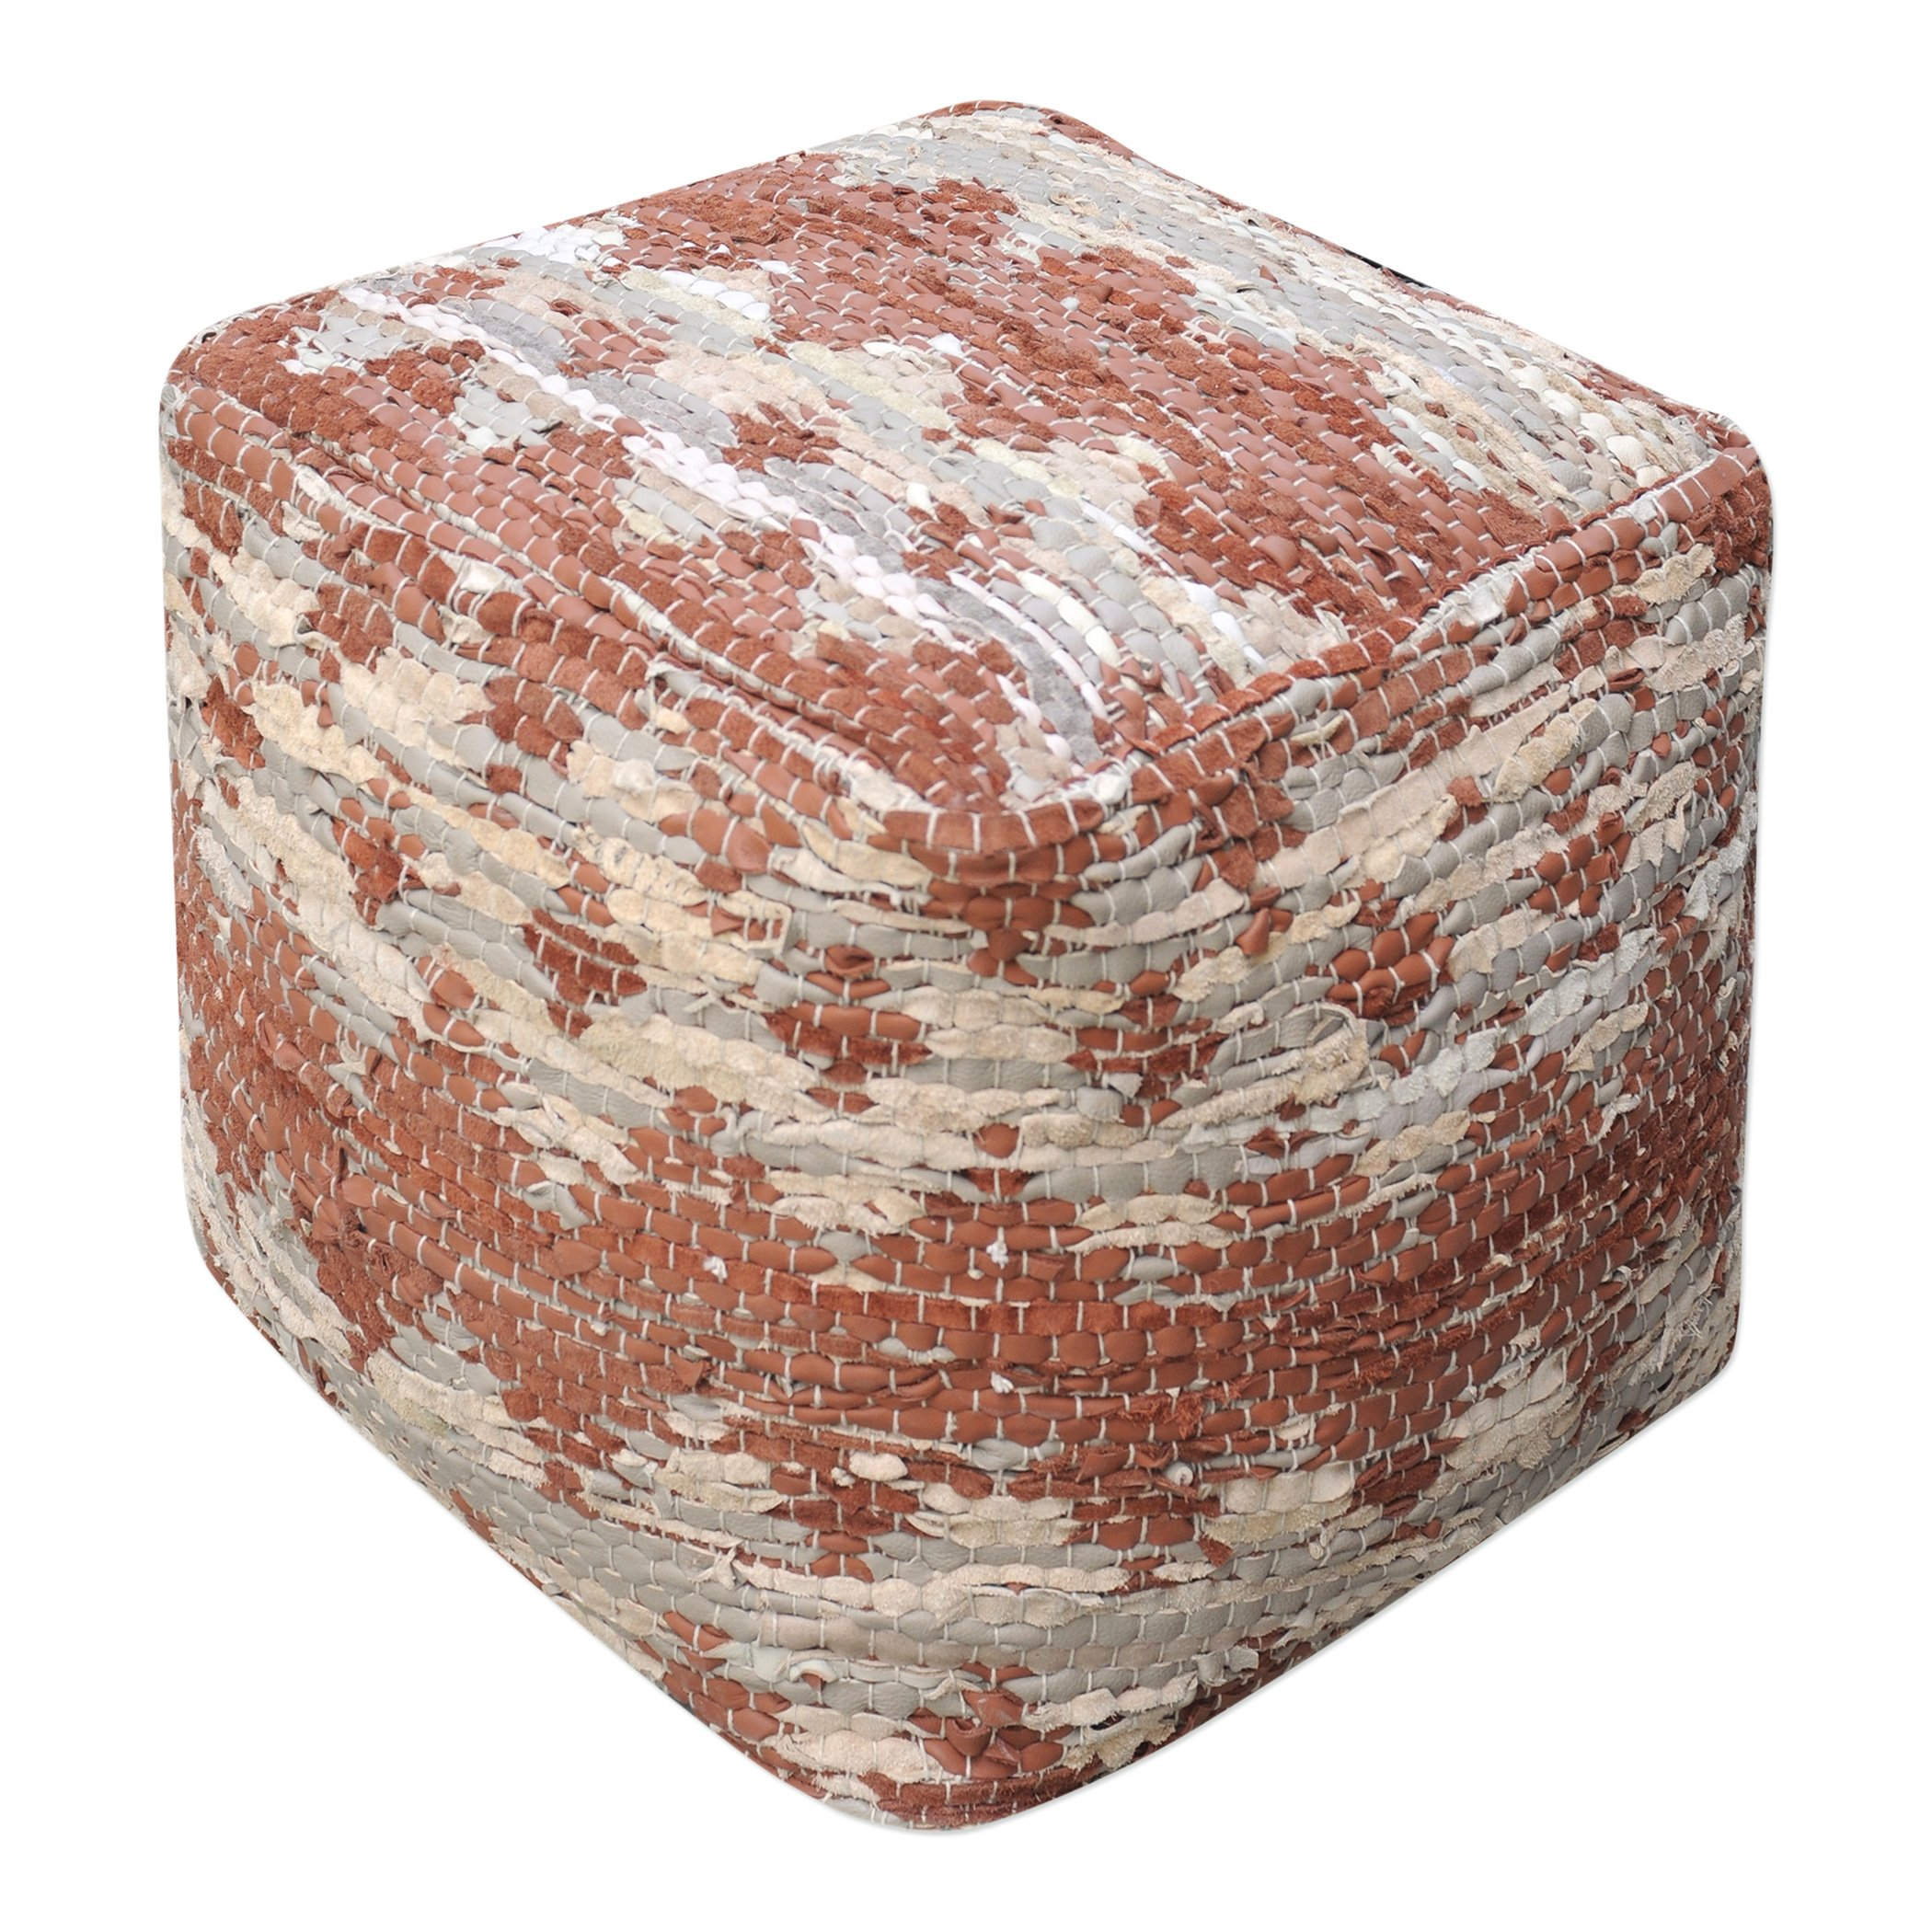 Aztec Pattern Rust Brown Beige Pouf | Ikat Tribal Cube Fabric Argyle Seat Square